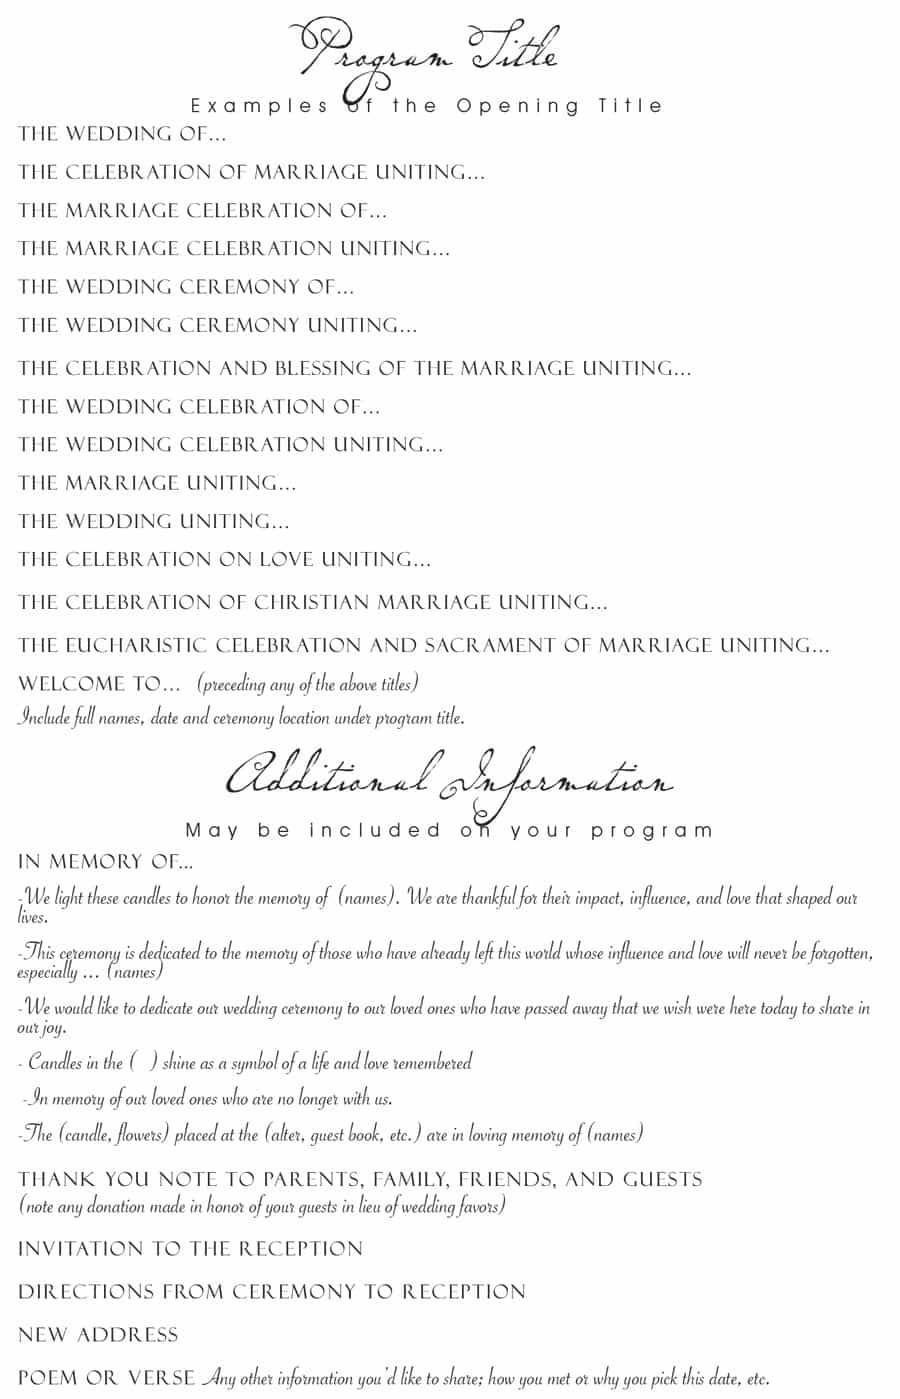 37 Printable Wedding Program Examples & Templates ᐅ Template Lab - Free Printable Wedding Program Samples